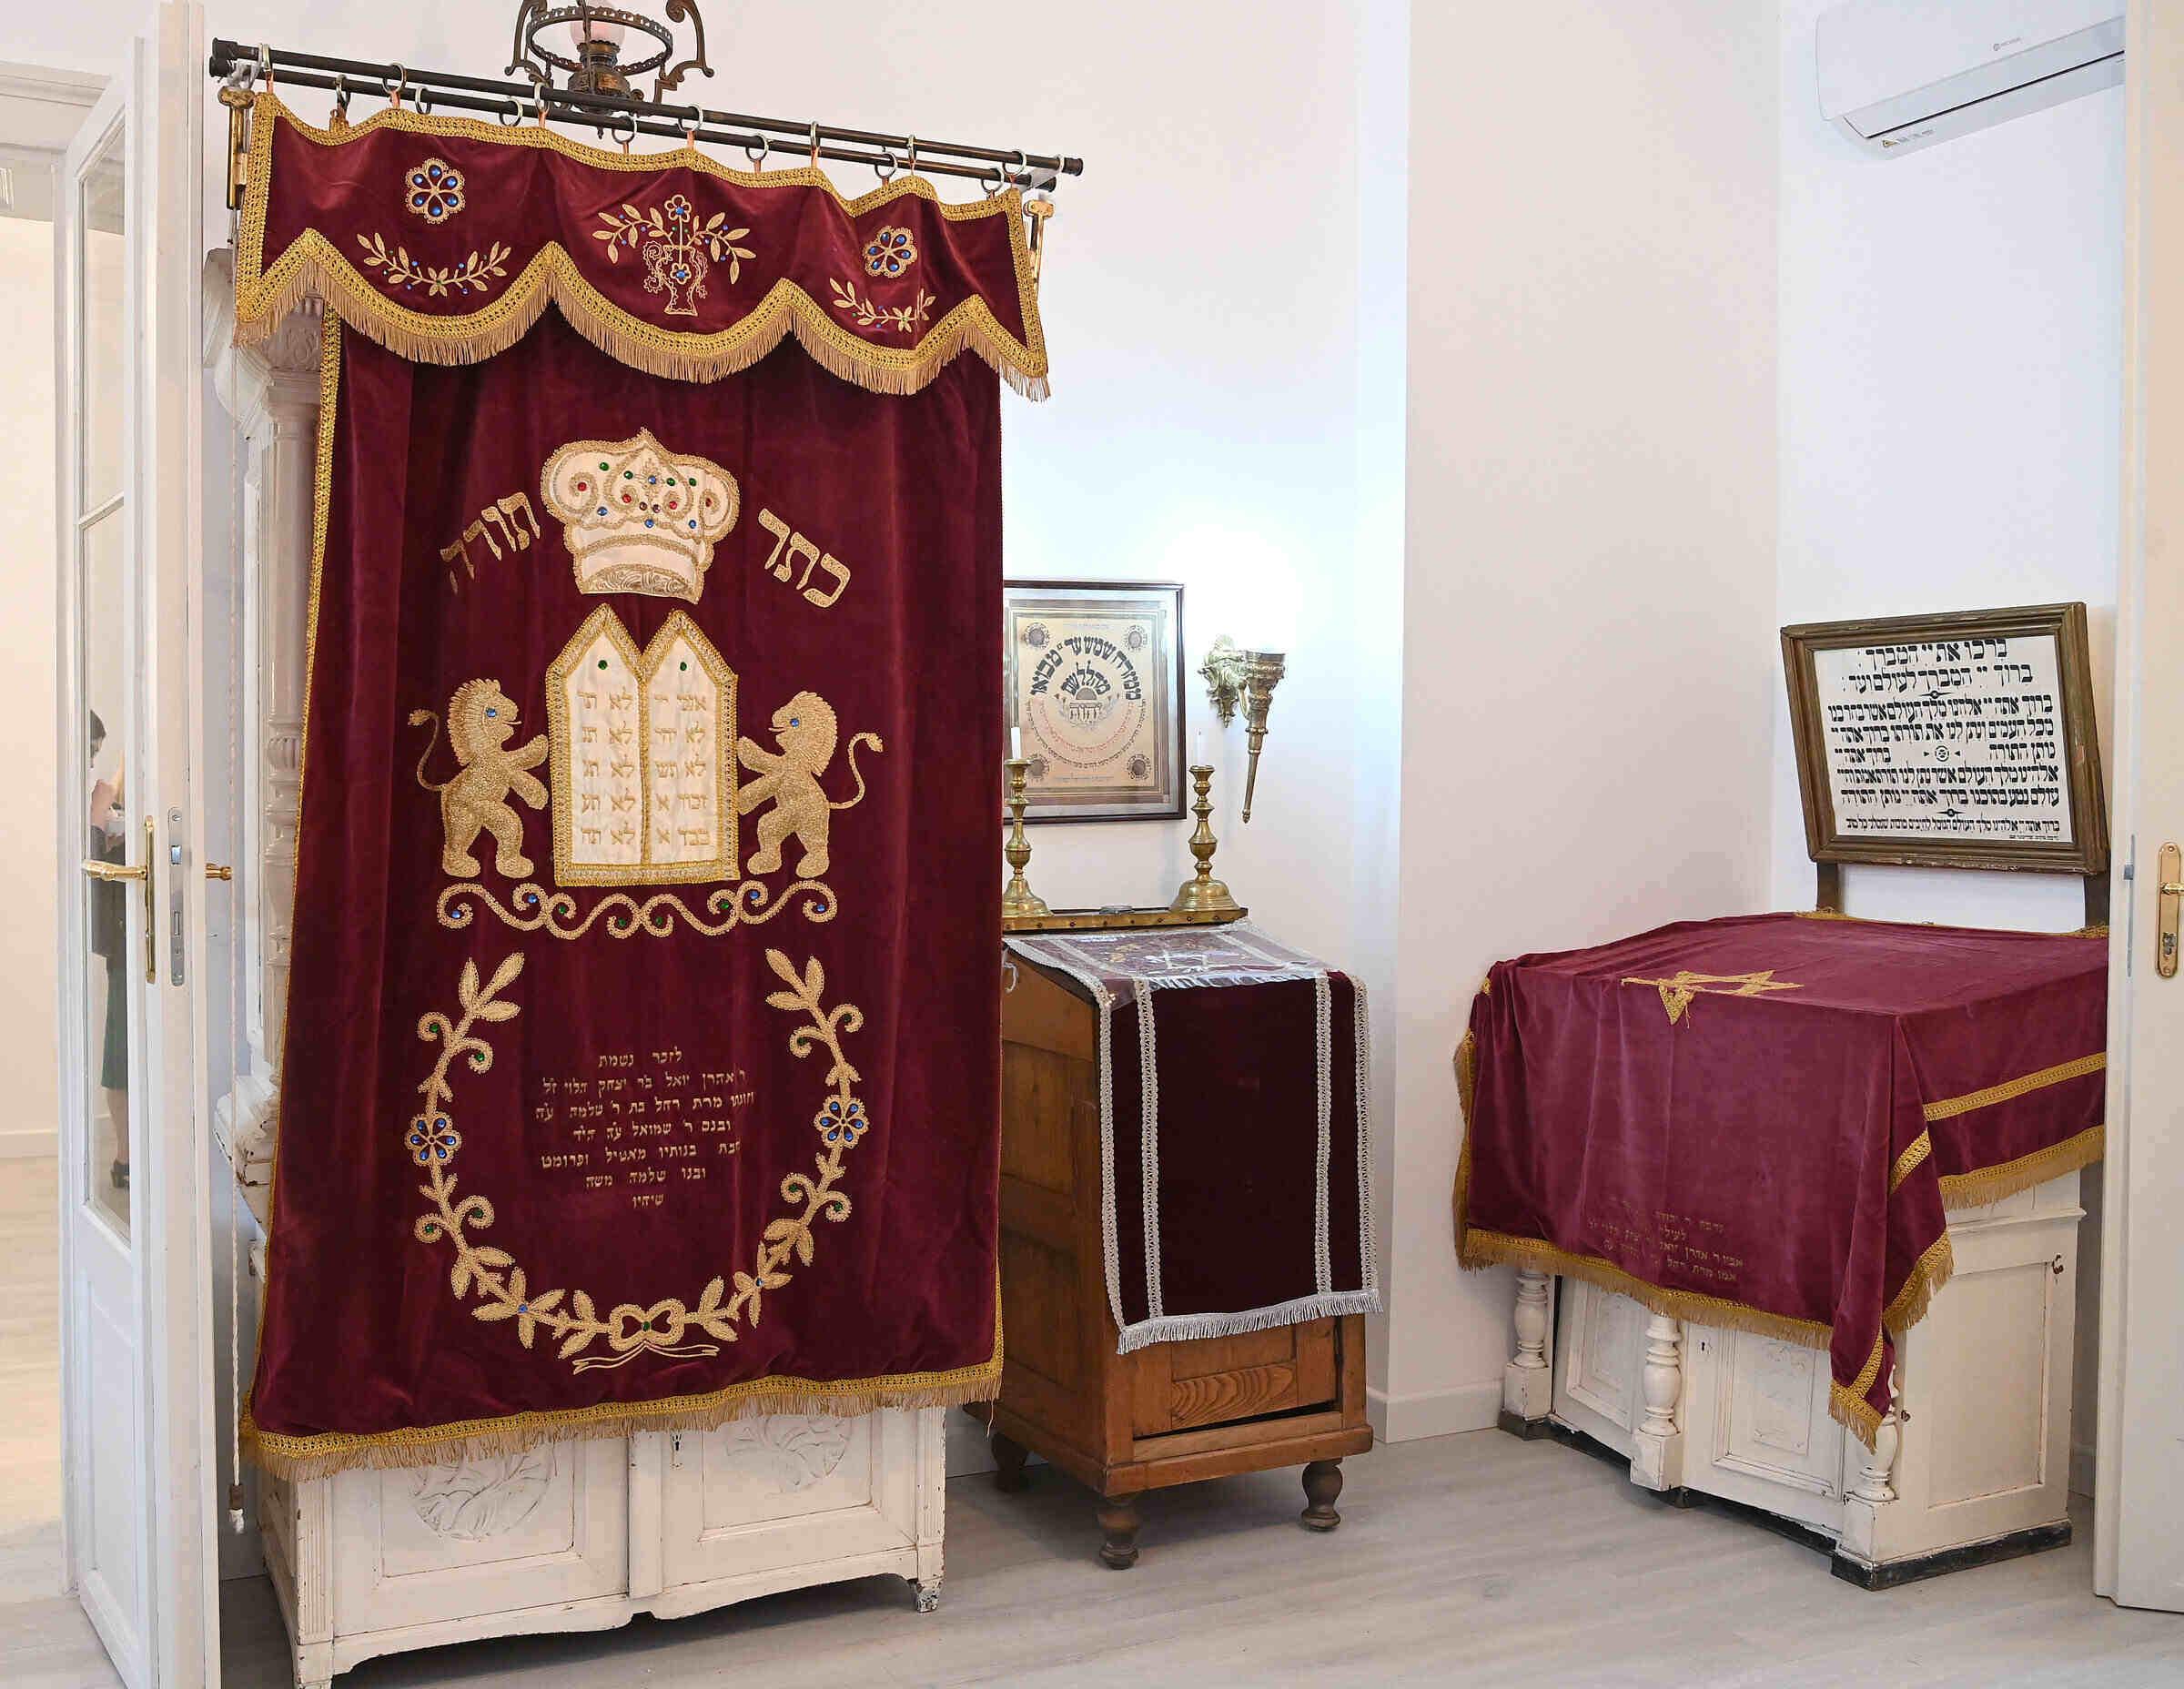 Budapest Hungary synagogue